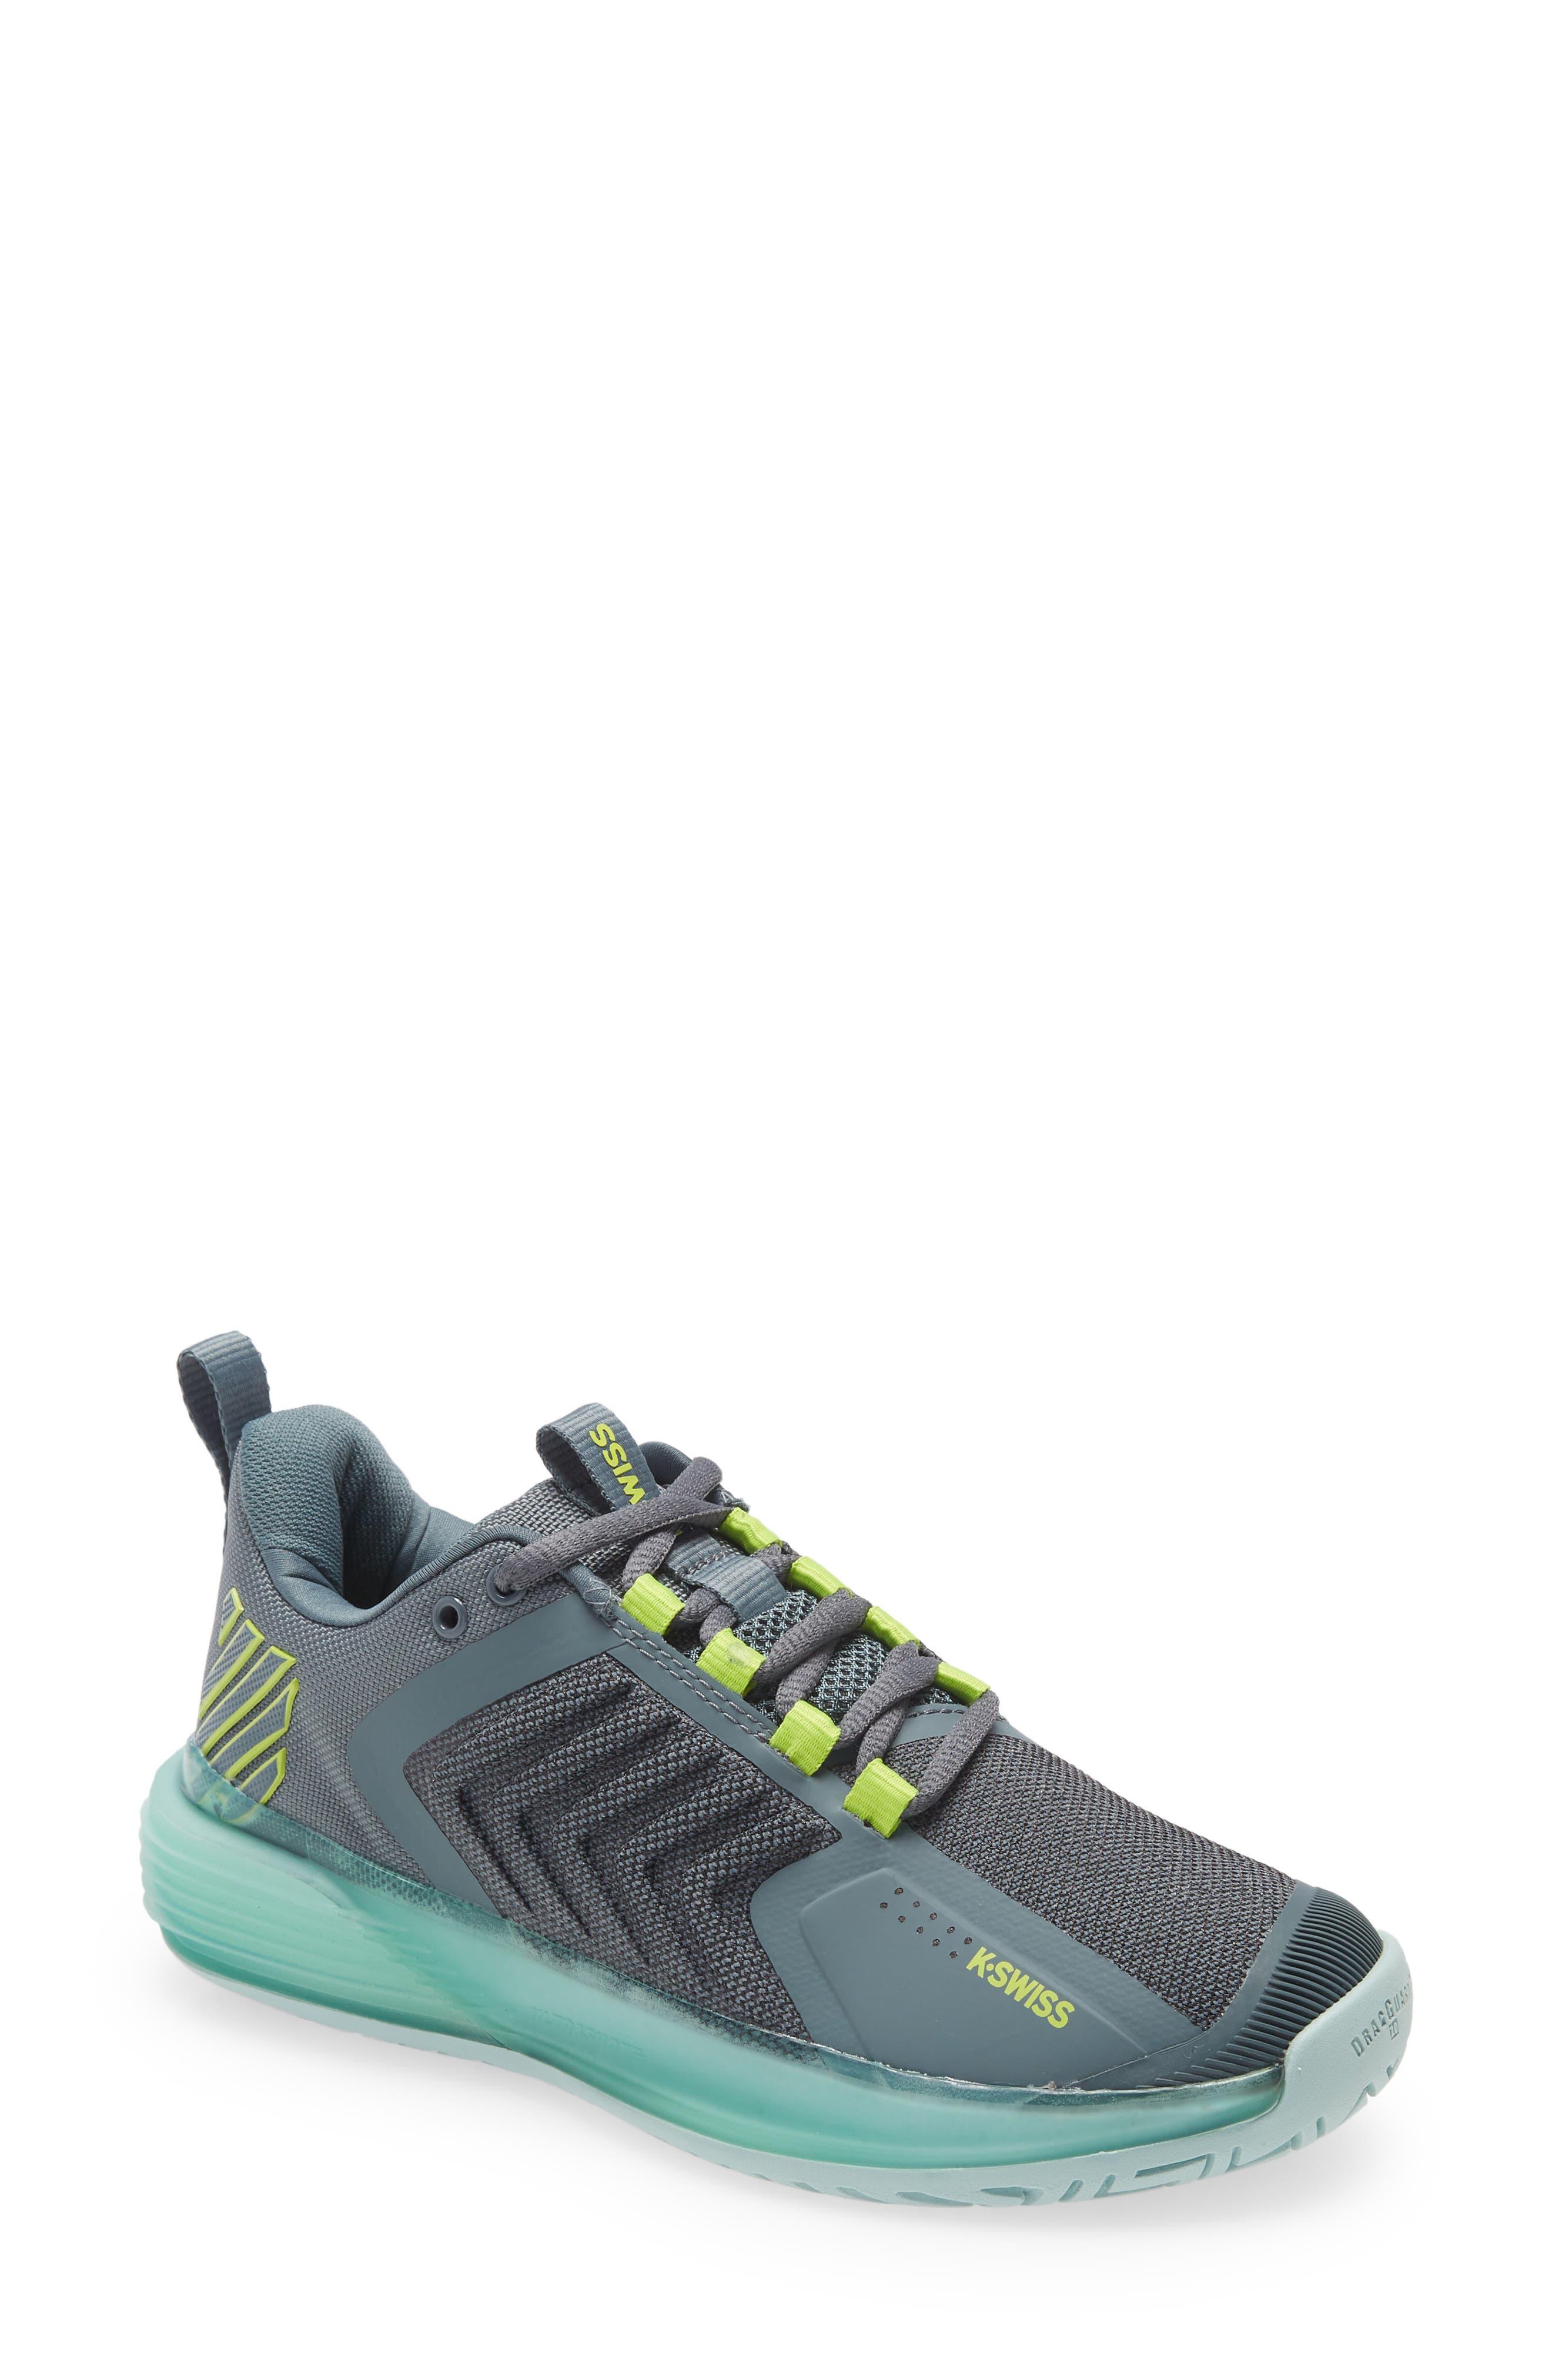 Ultrashot 3 Tennis Shoe